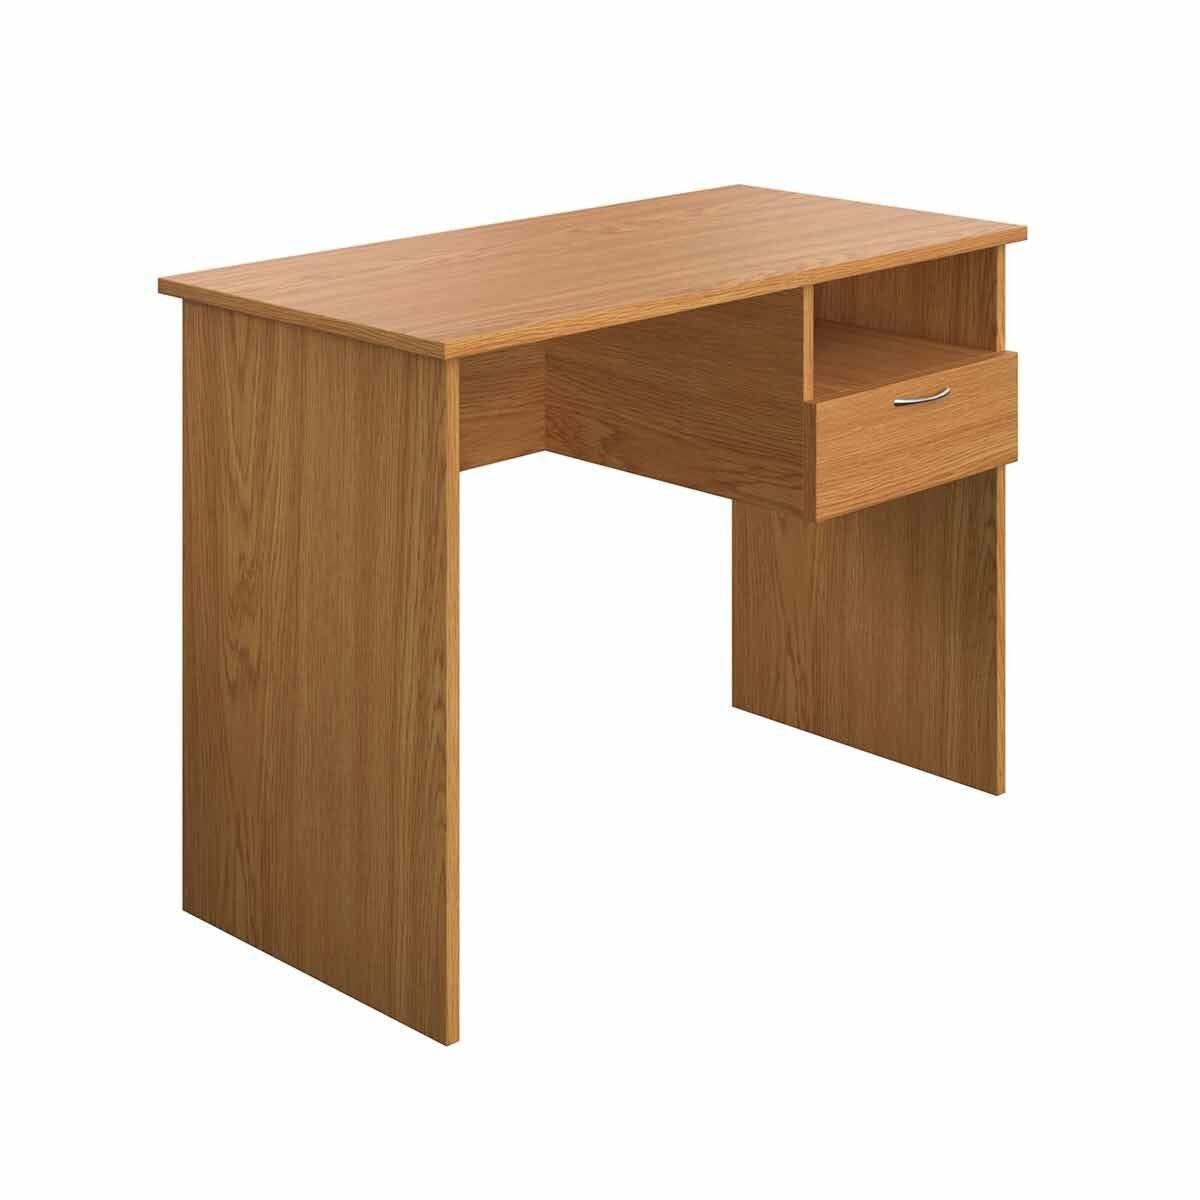 TC Office Eco Homework Desk with Drawer 100cm Oak